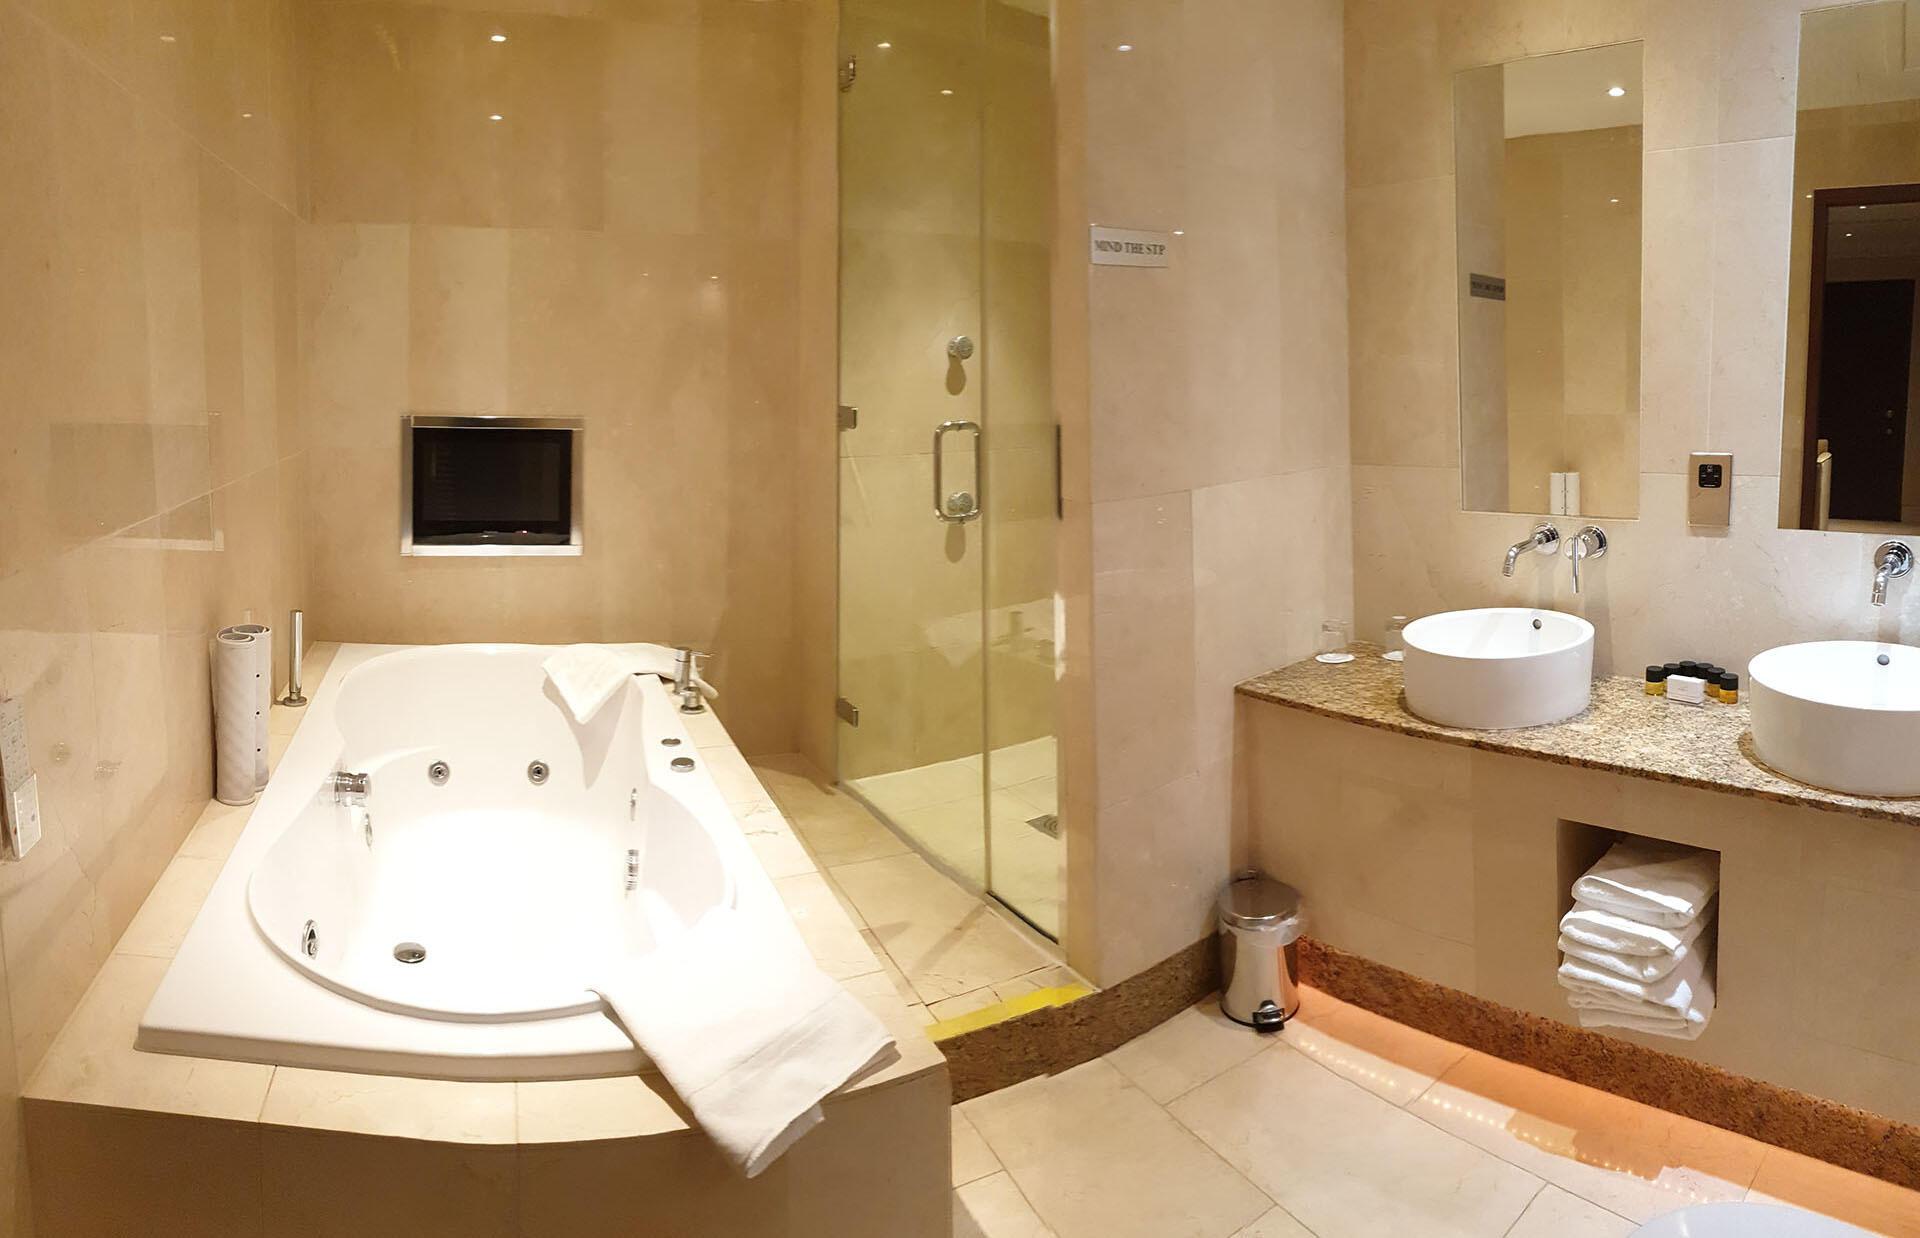 Deans Lodge Junior Suite Bath at The Barn Hotel, Ruislip